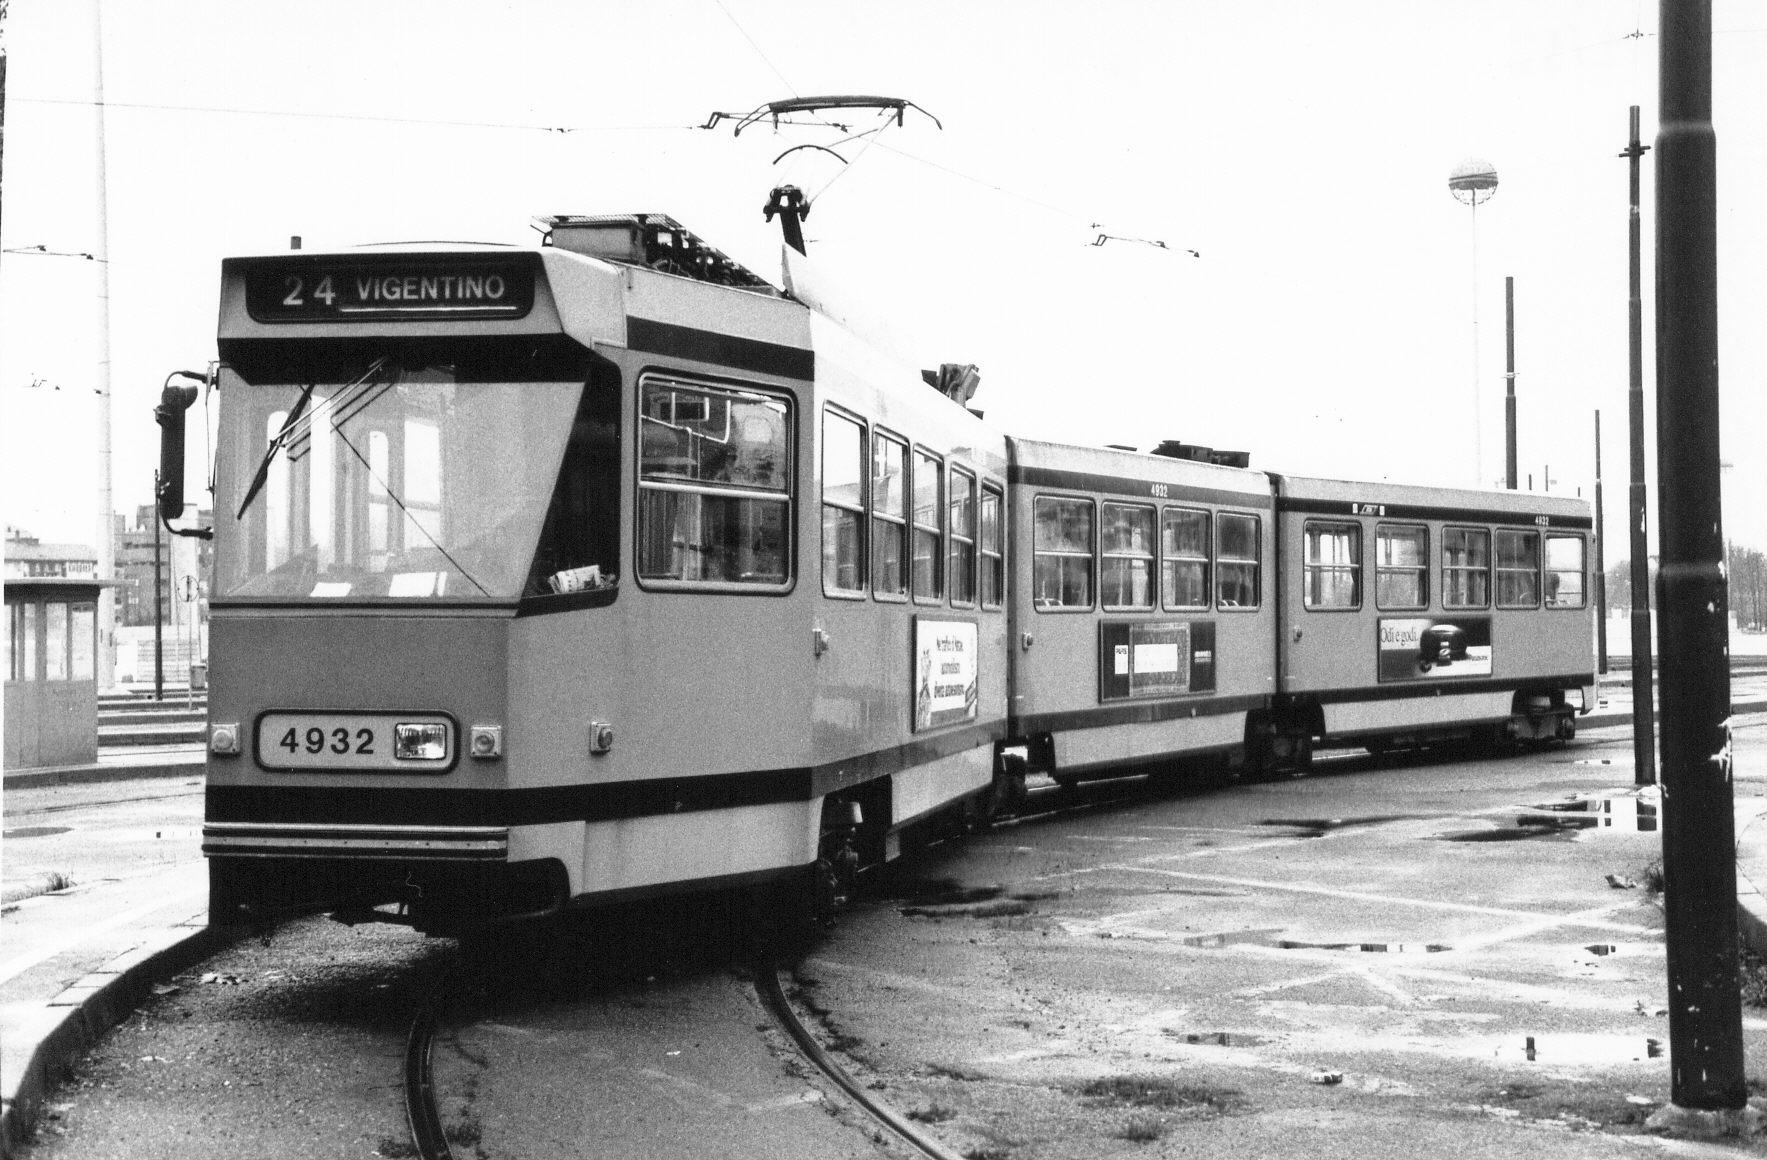 El juego de las imagenes-http://upload.wikimedia.org/wikipedia/commons/b/b7/Milano_tram_4932.jpg